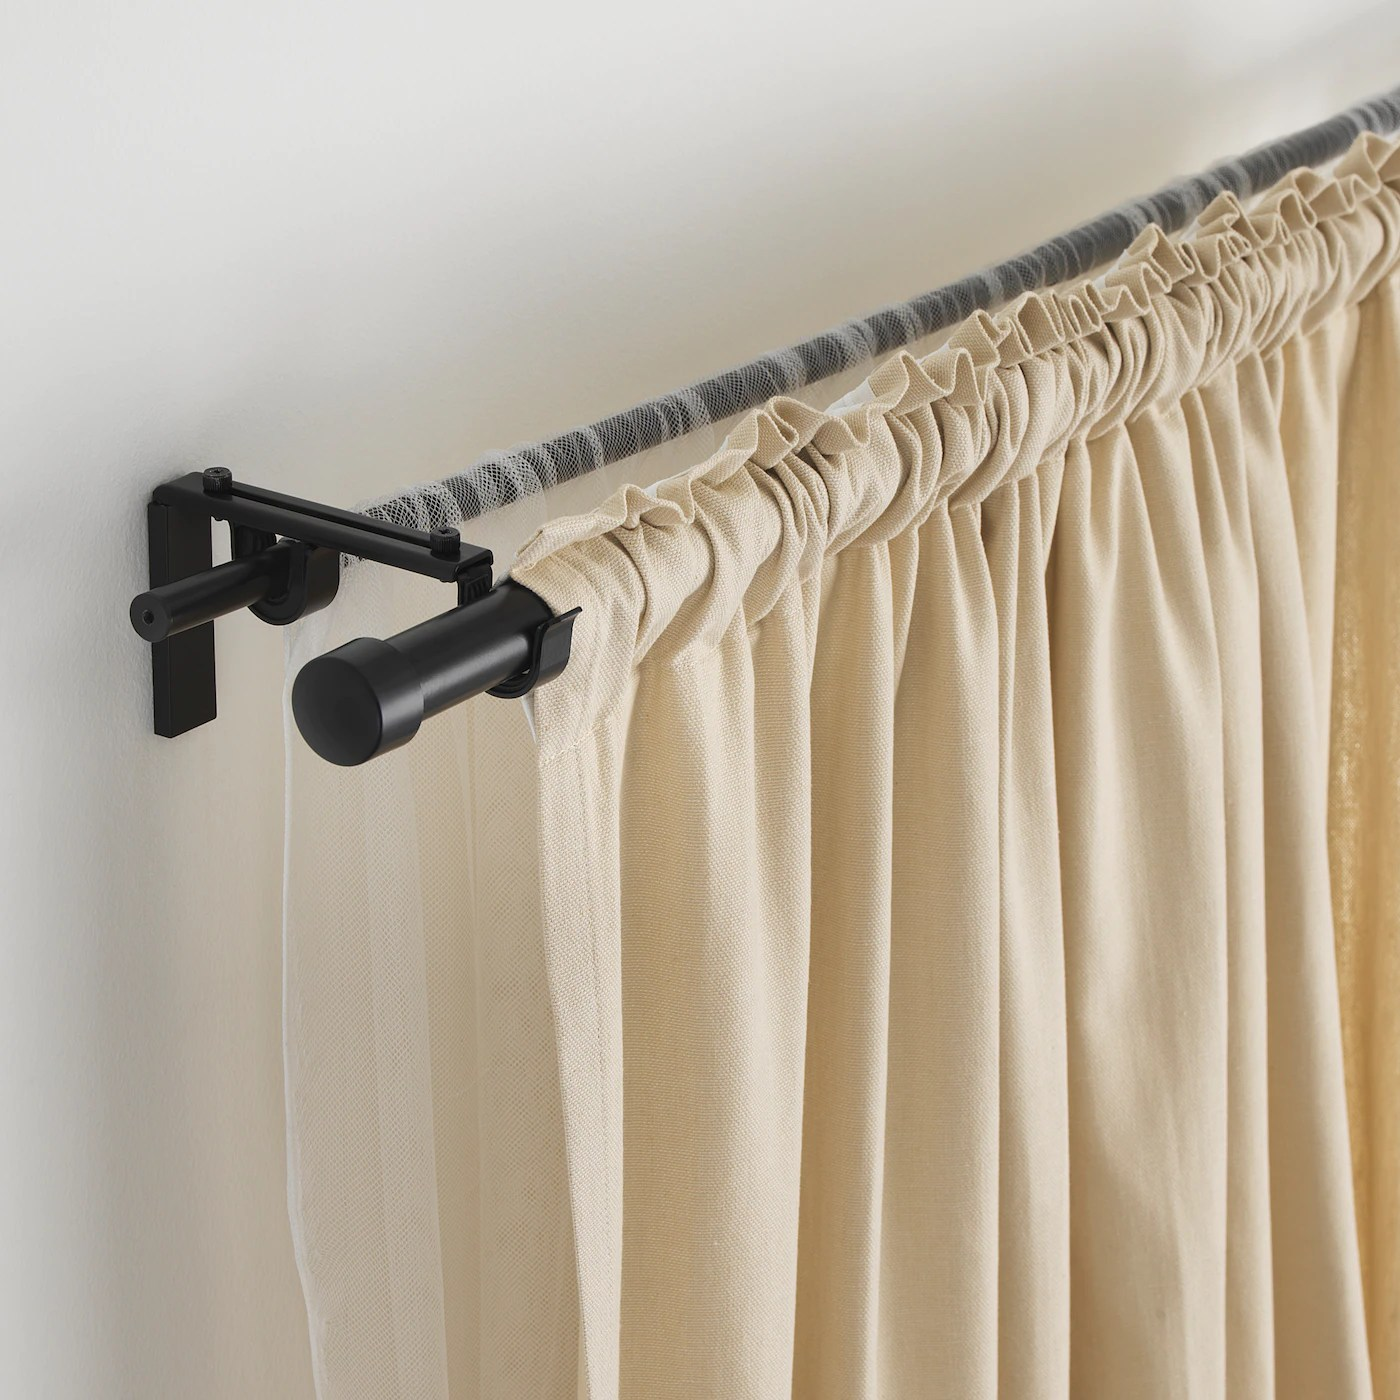 hugad curtain rod black 120 210 cm